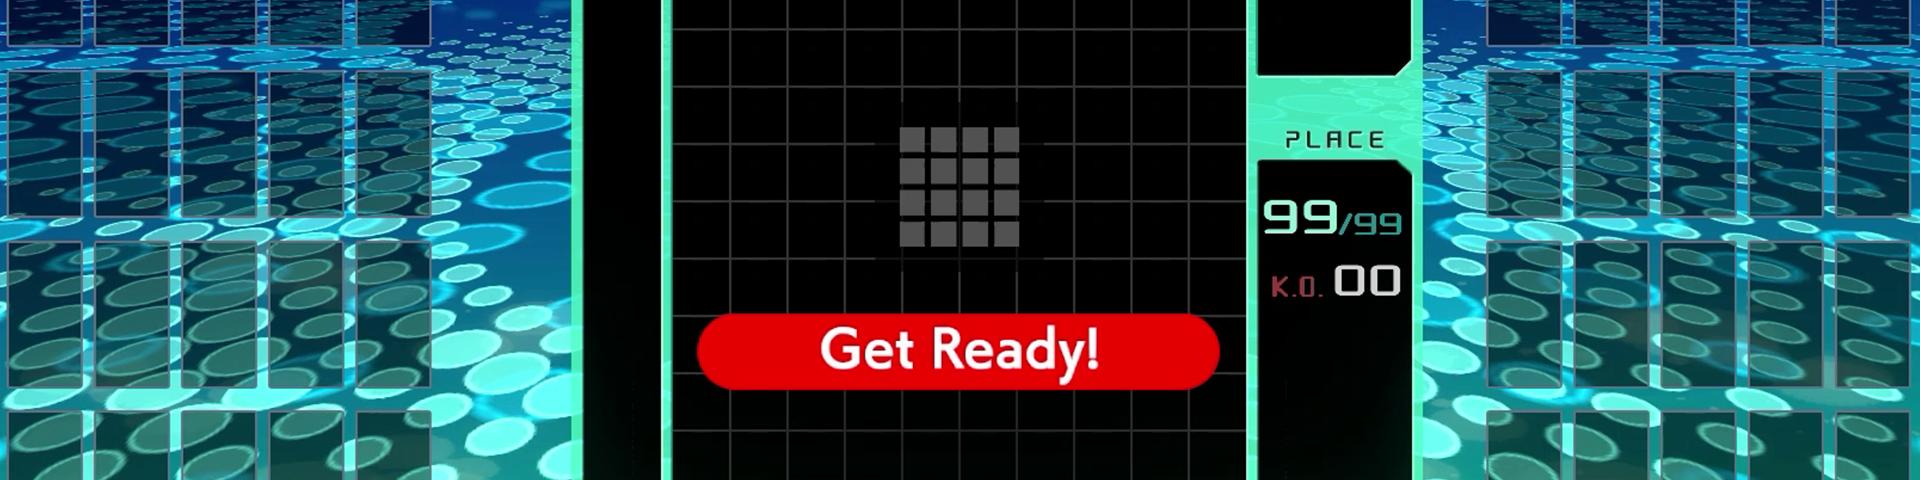 Tetris 99 header.png